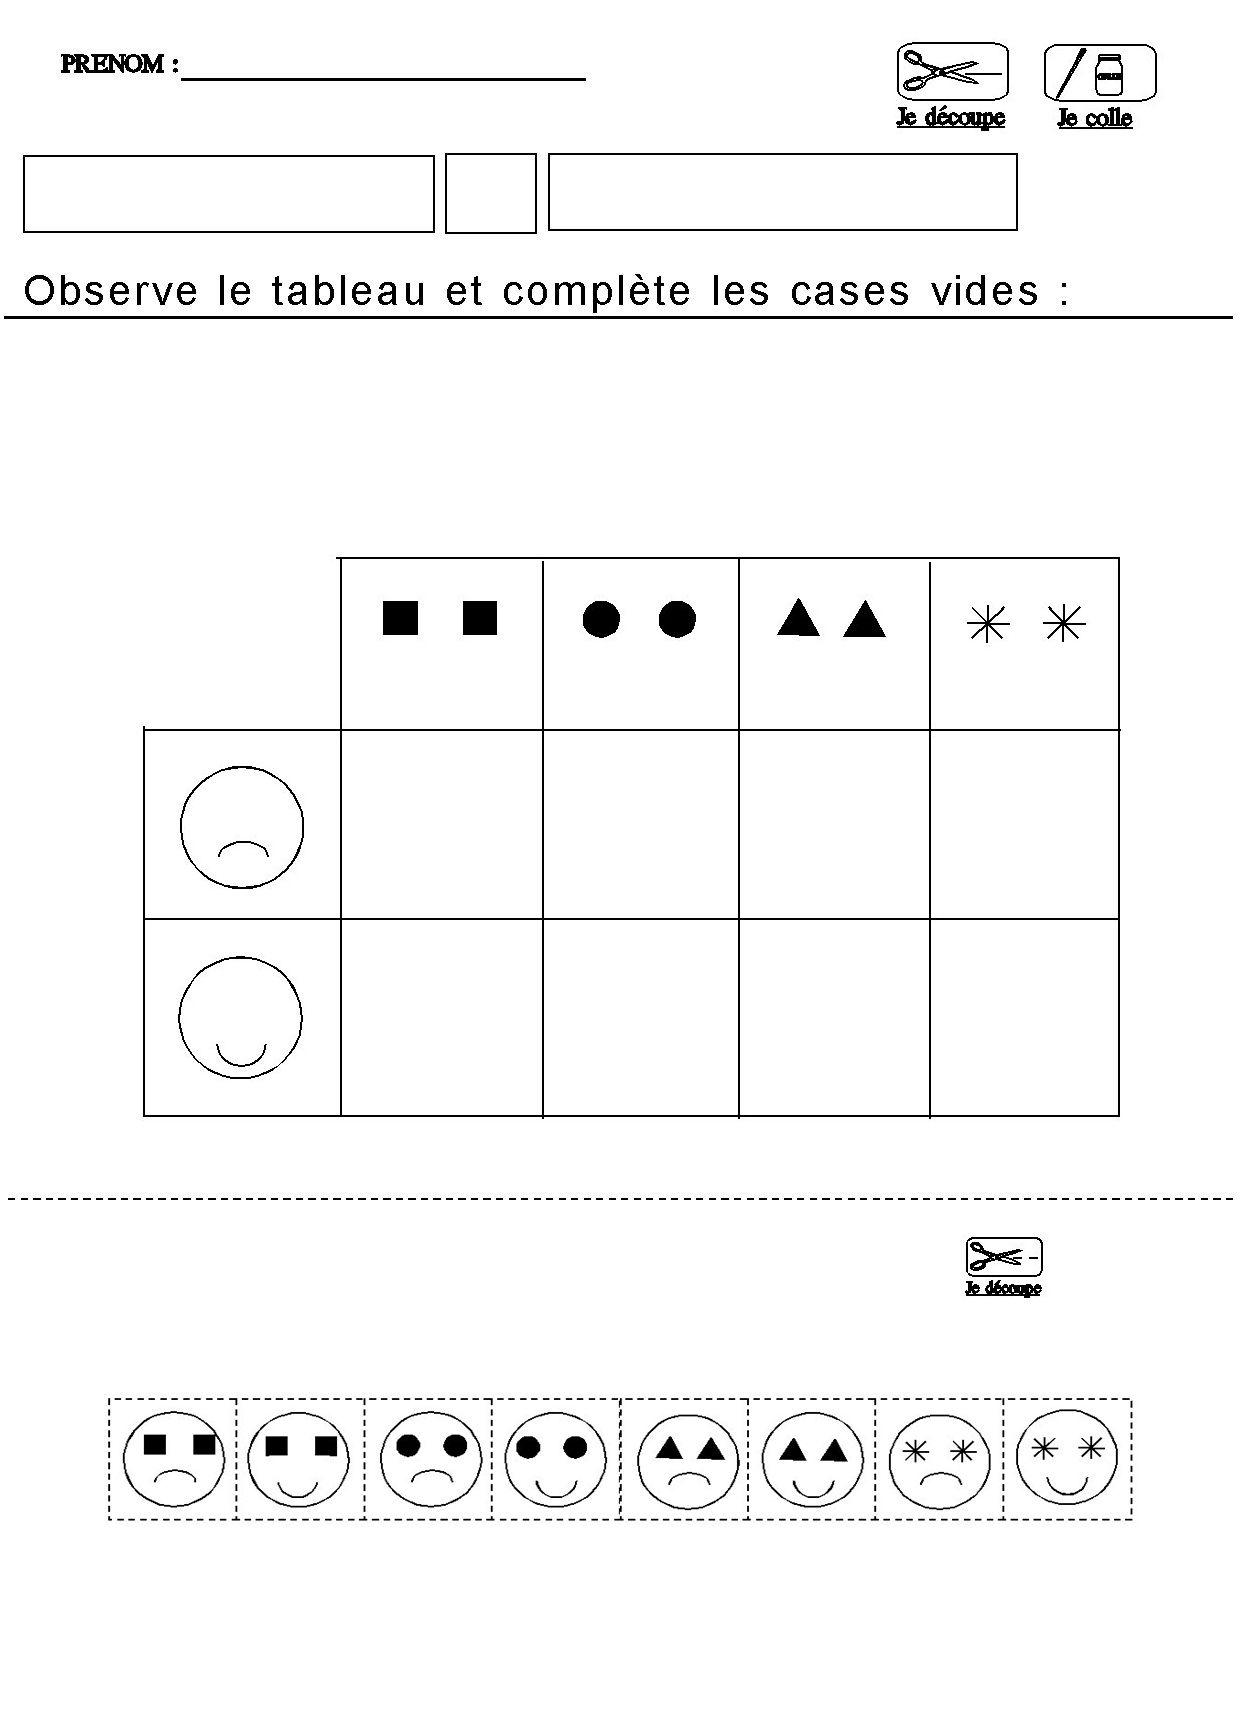 Tableau Double Entrees Pour Maternelle Moyenne Section